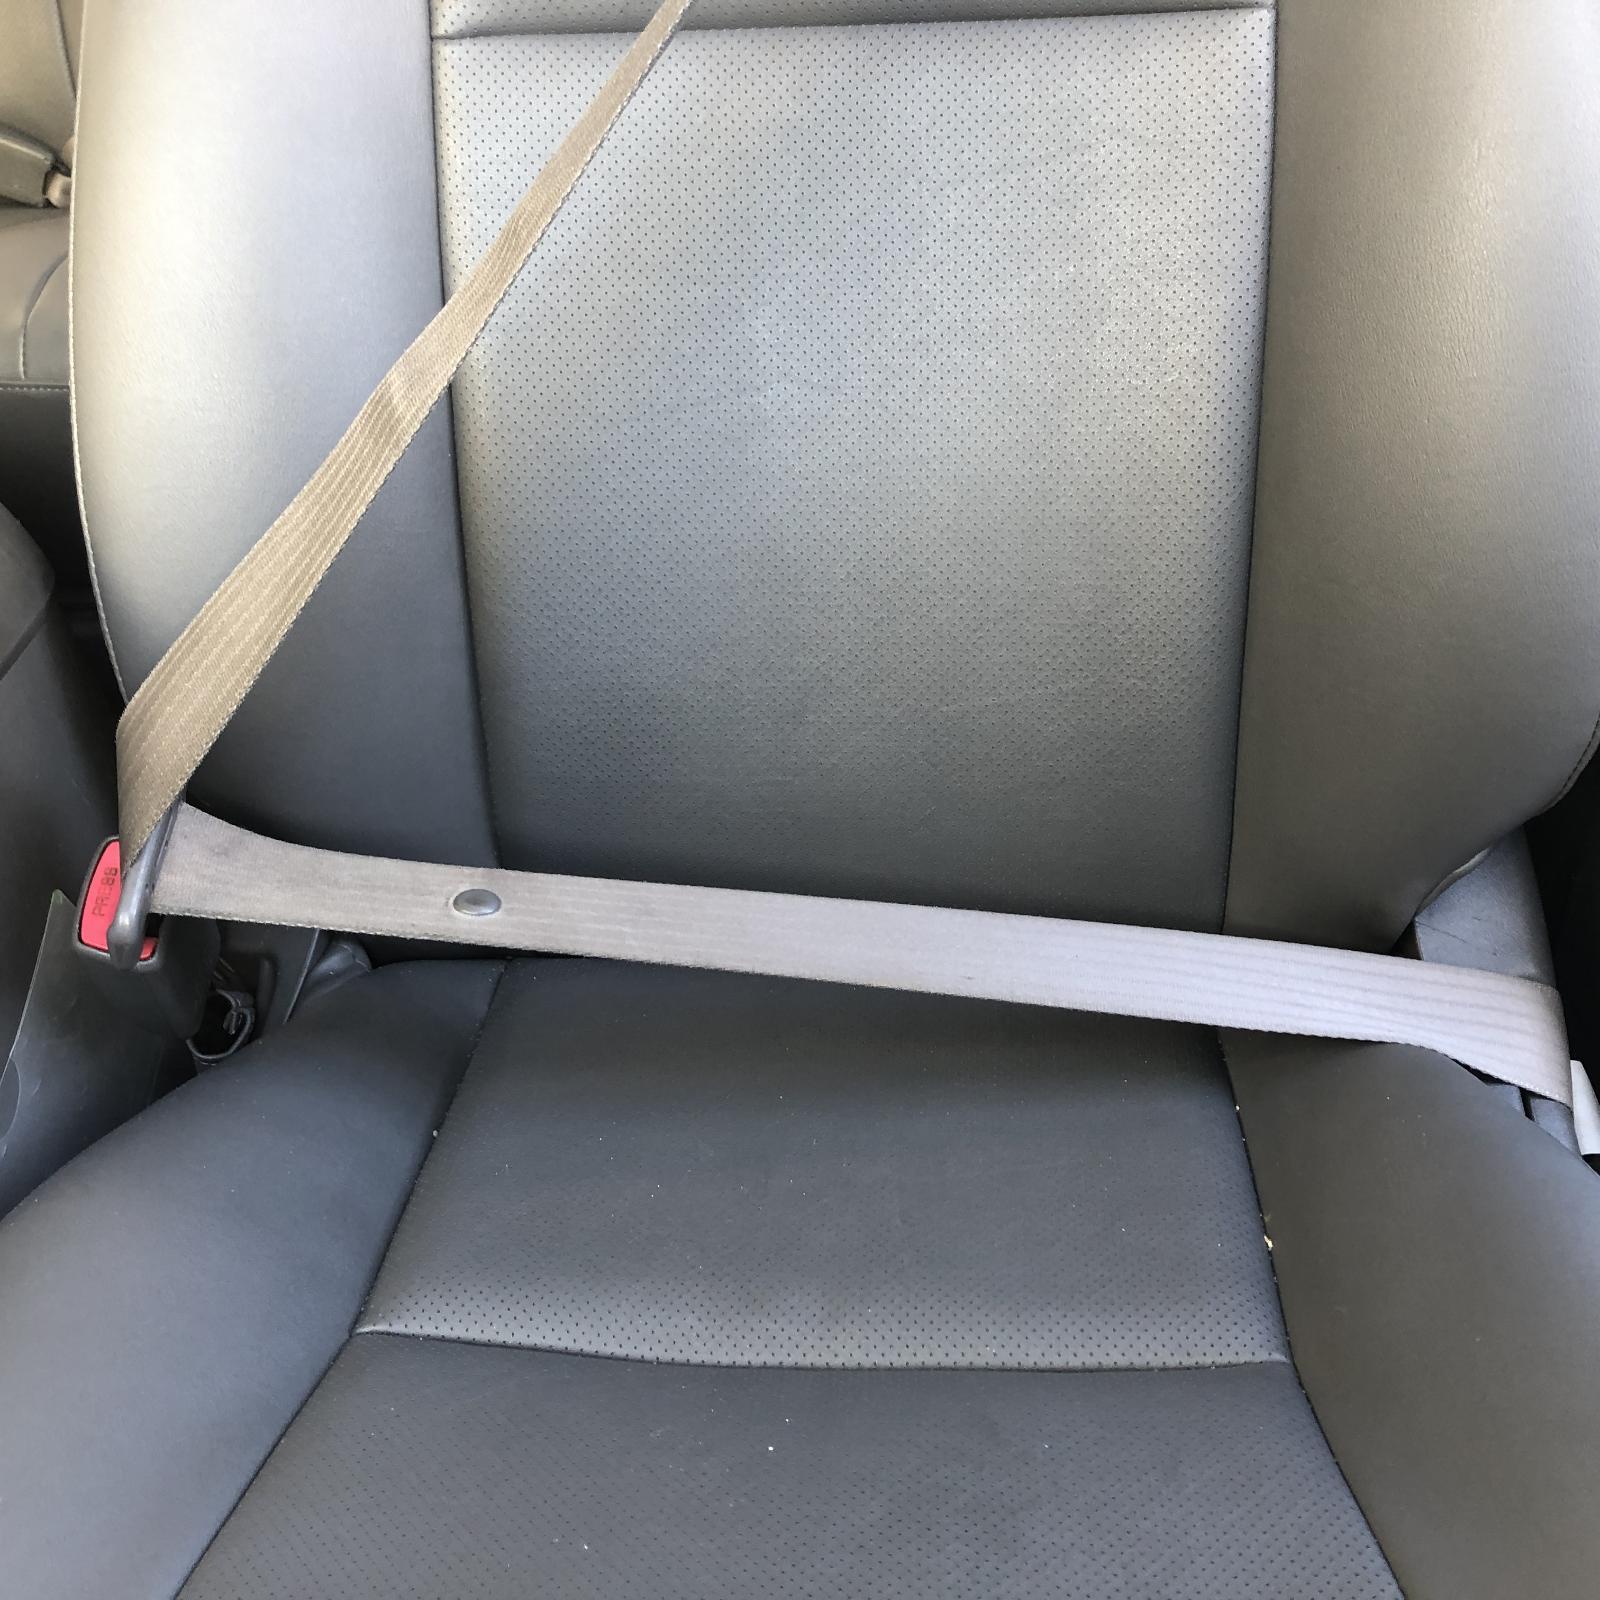 TOYOTA HILUX, Seatbelt/Stalk, LH FRONT, SEAT BELT ONLY, DUAL CAB, 07/11-08/15